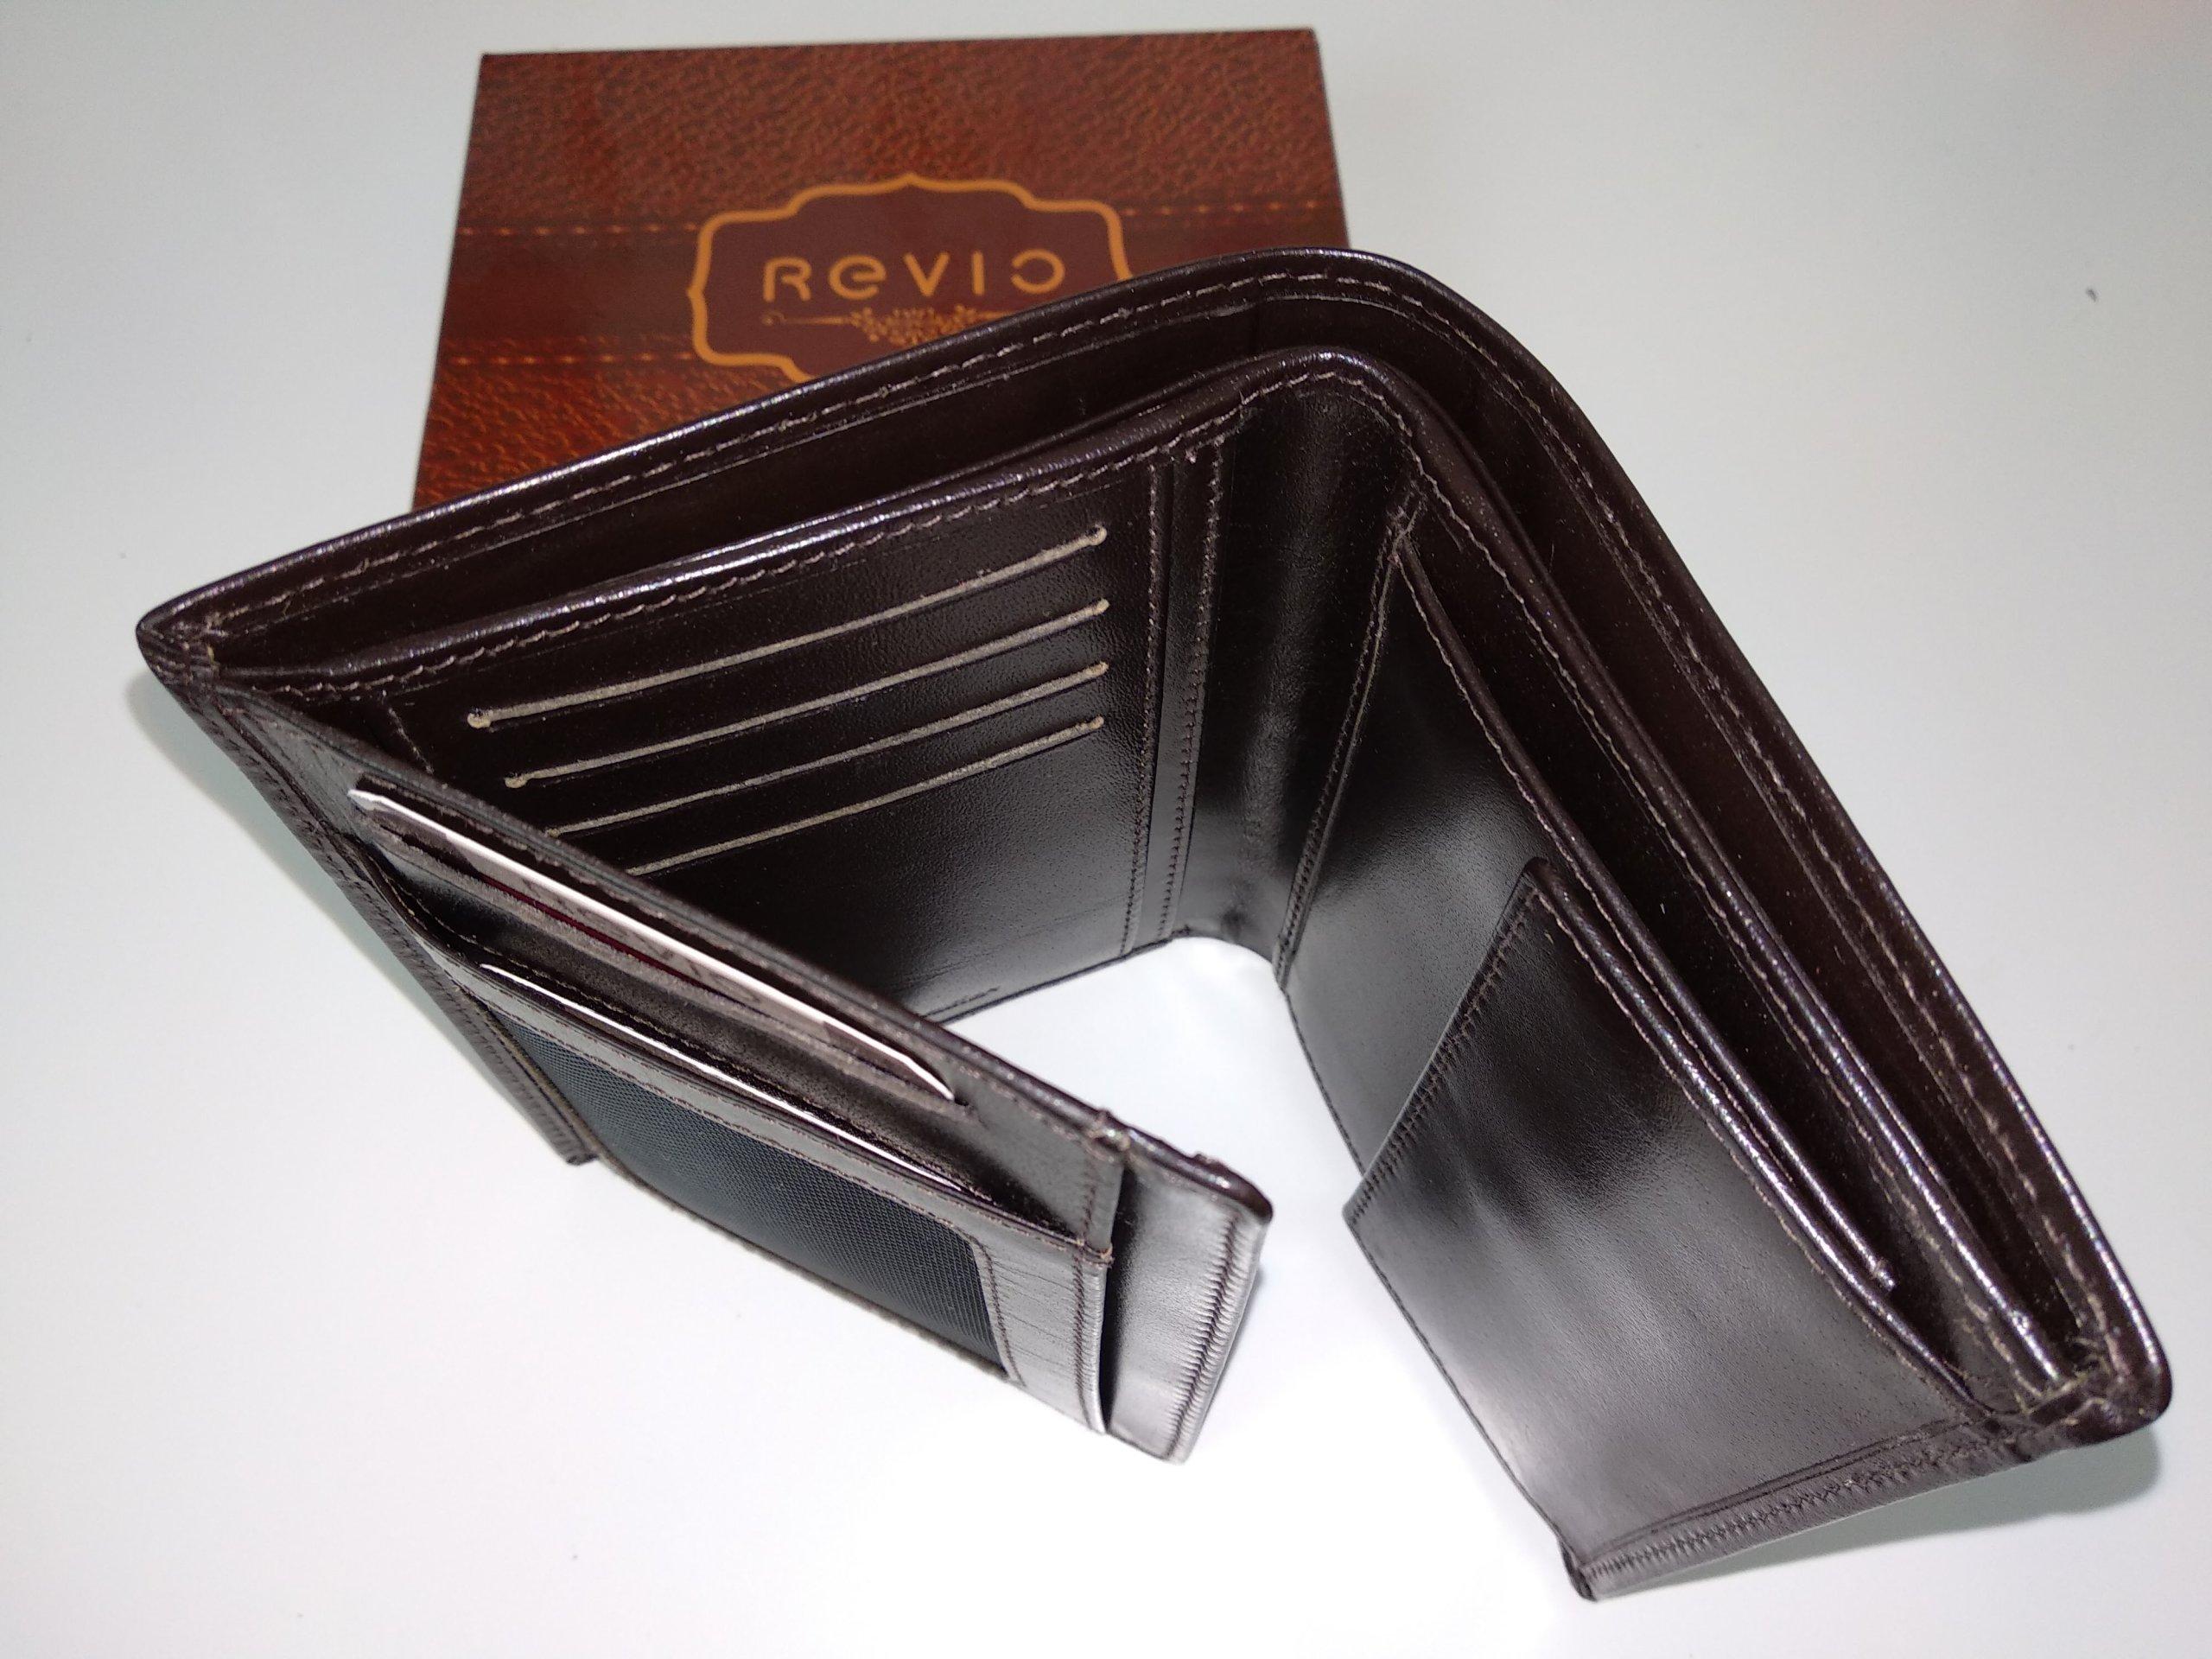 e0c6c7289168f Polski portfel męski Revio, skóra naturalna NOWY - 7231516487 ...